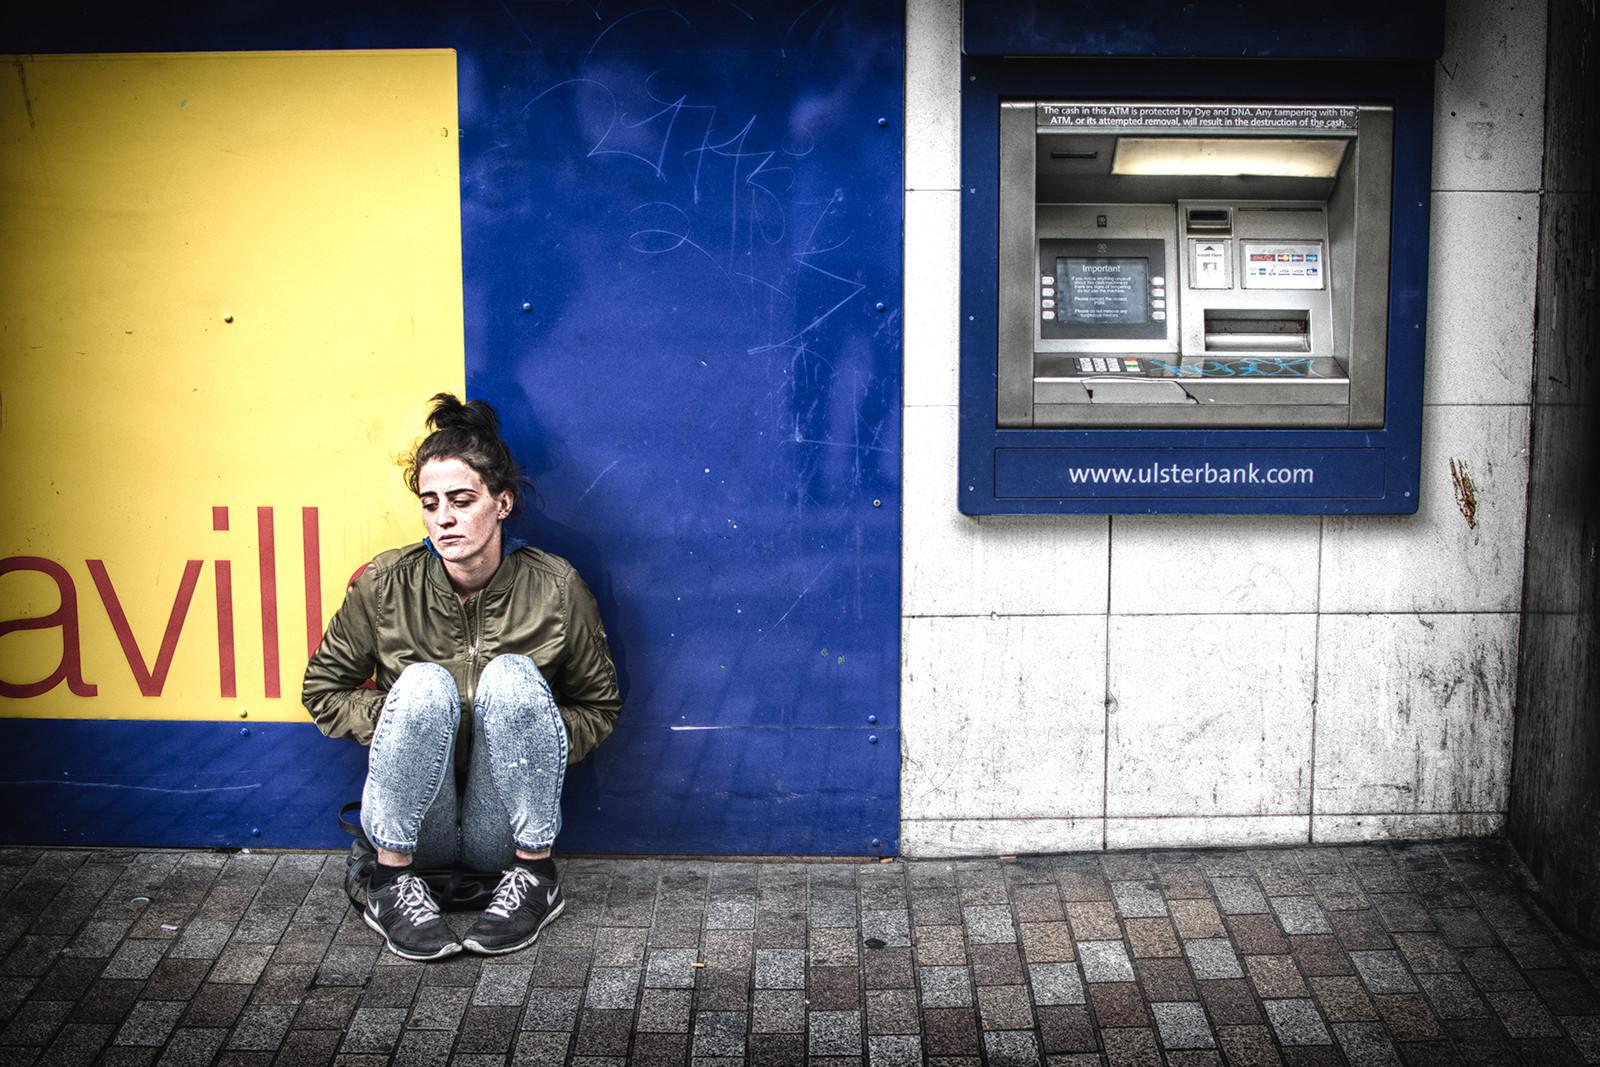 COLOUR - Cashless by Ian Clarke (10 marks)